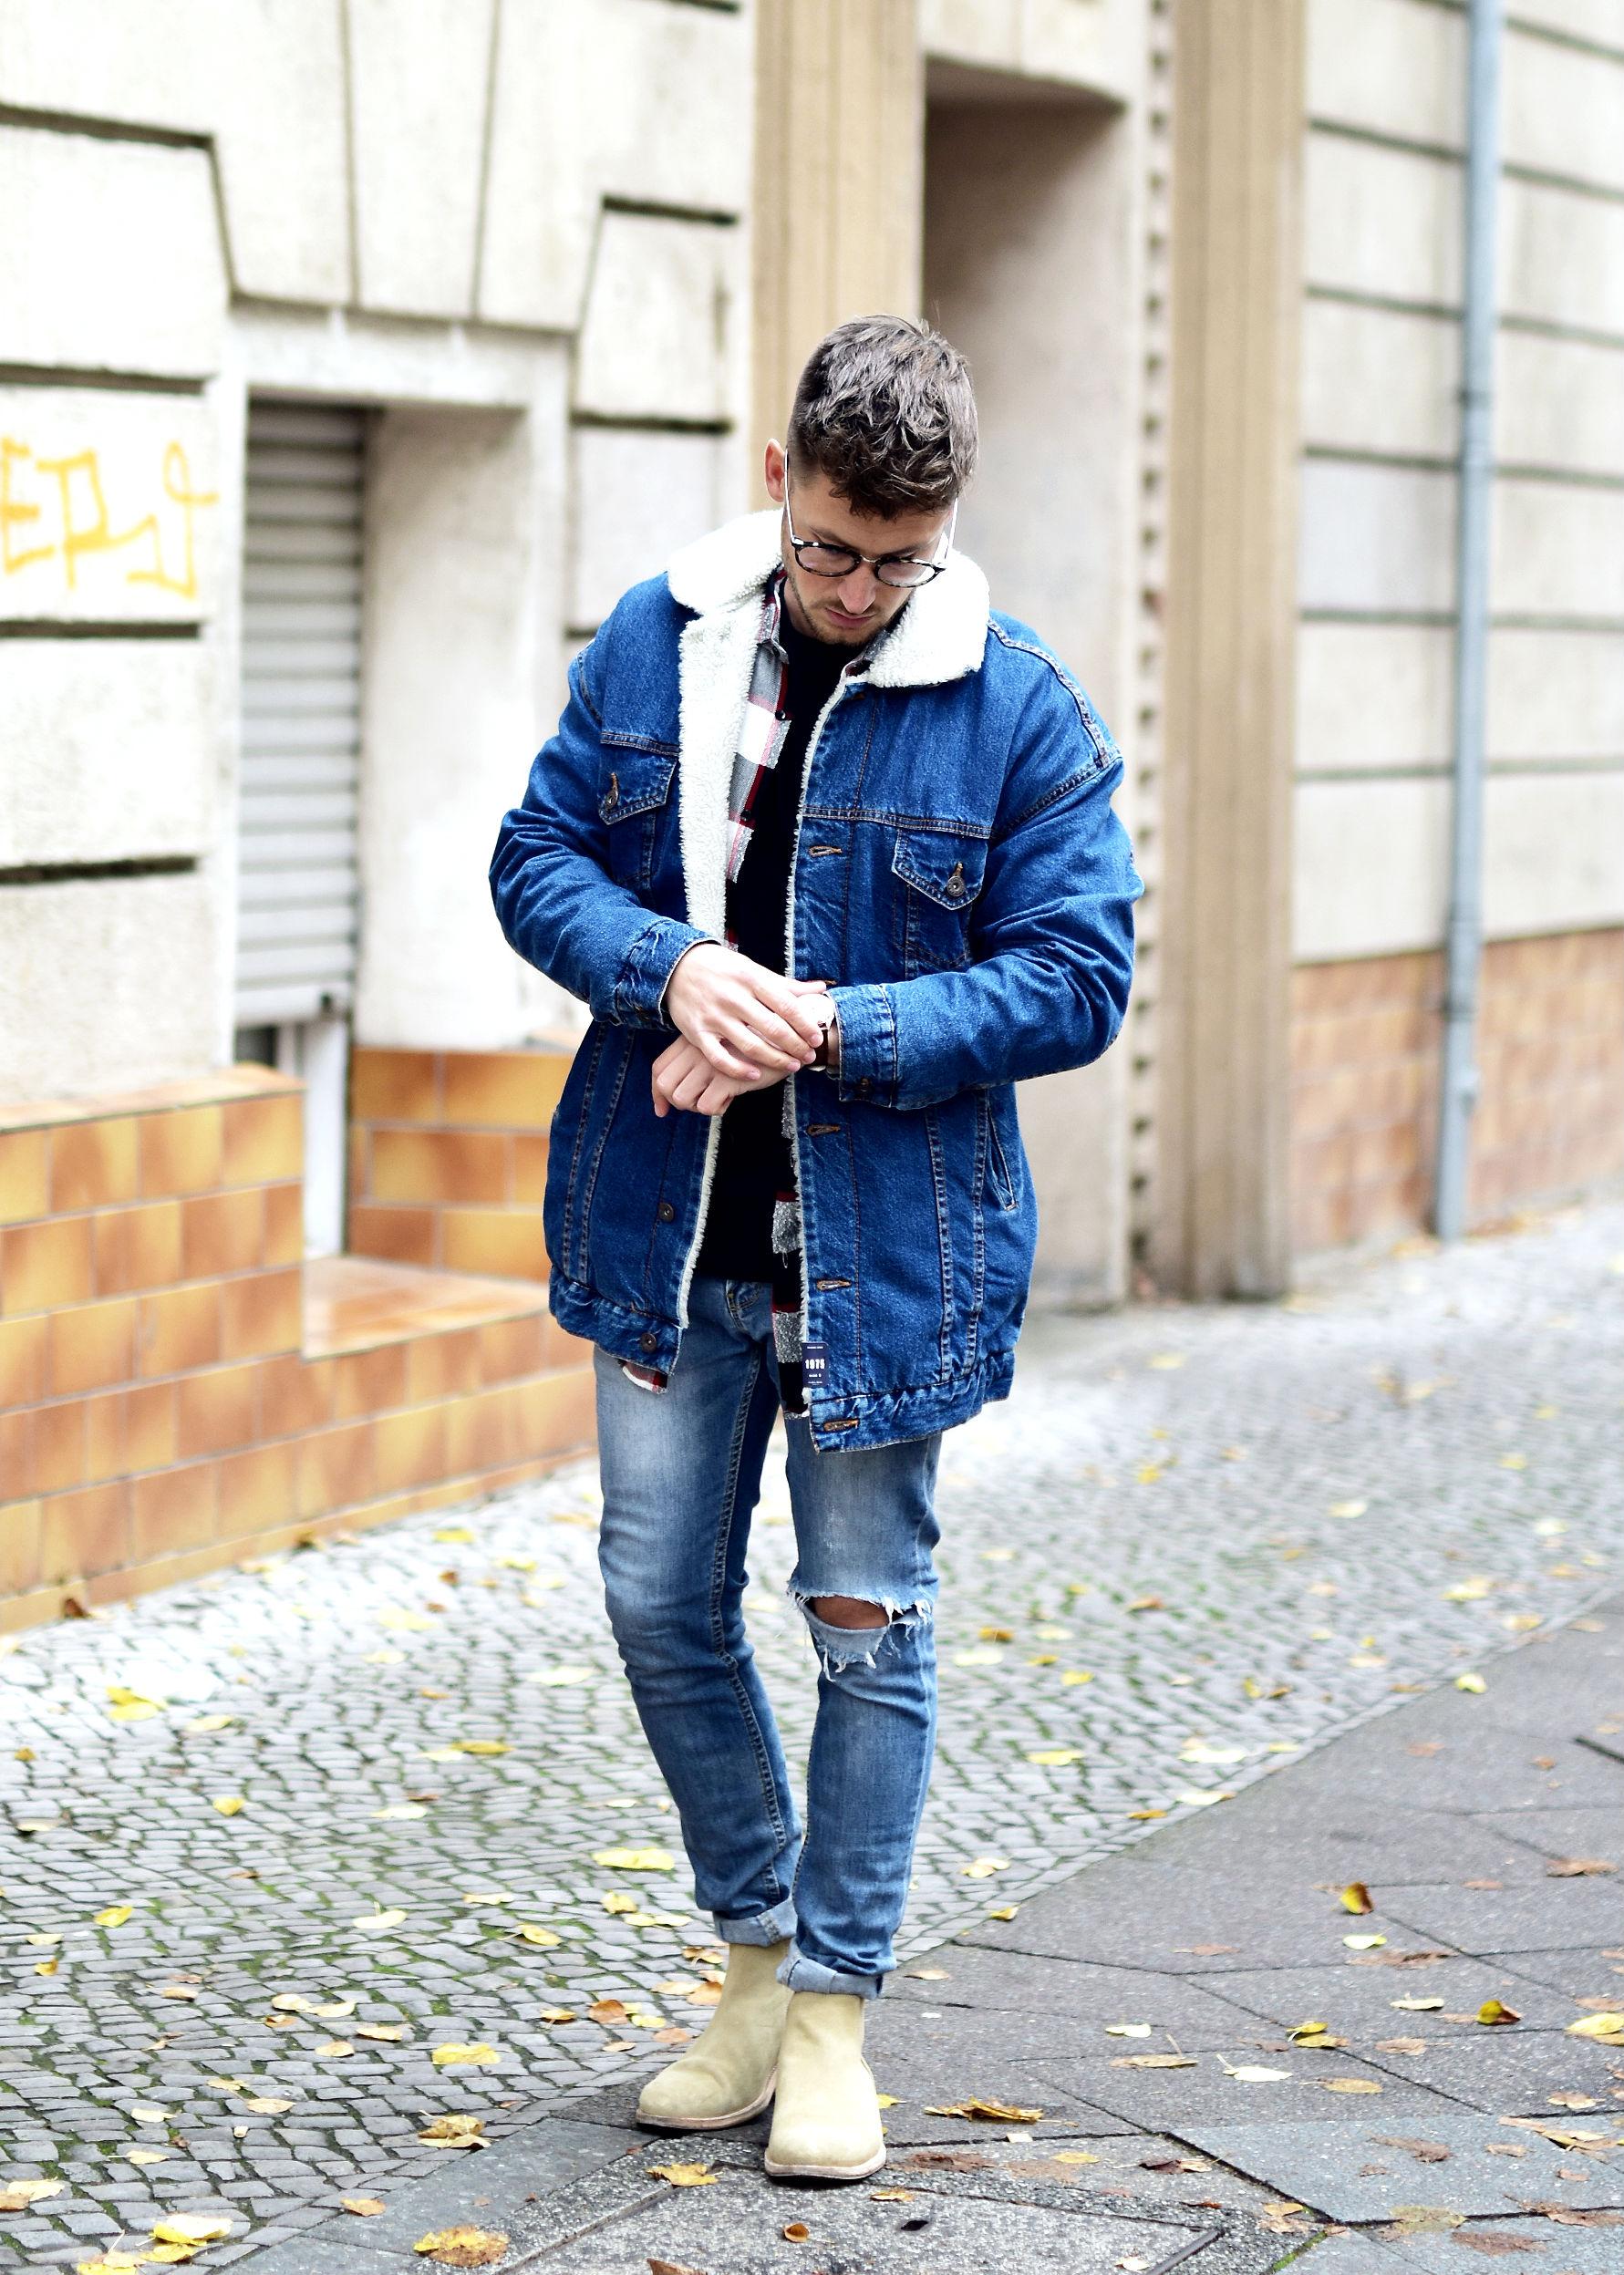 tommeezjerry-styleblog-maennerblog-maenner-modeblog-berlin-berlinblog-maennermodeblog-outfit-jeansjacke-fell-felljeansjacke-chelseaboots-carohemd-streetstyle-